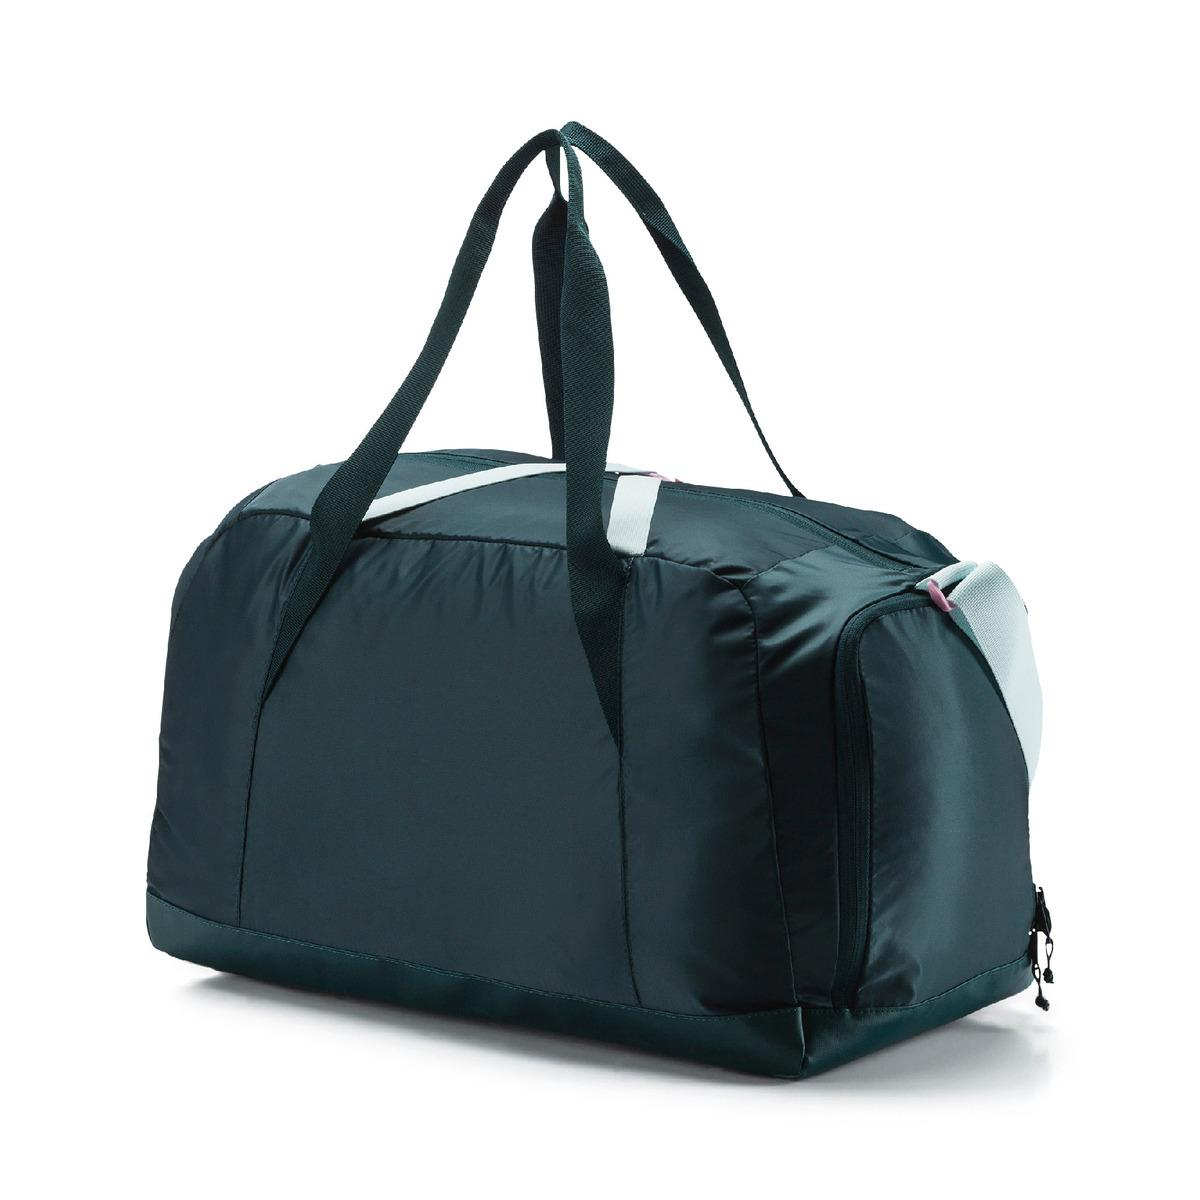 92d5fc82224475 Lyst - PUMA At Duffle Sports Bag in Green